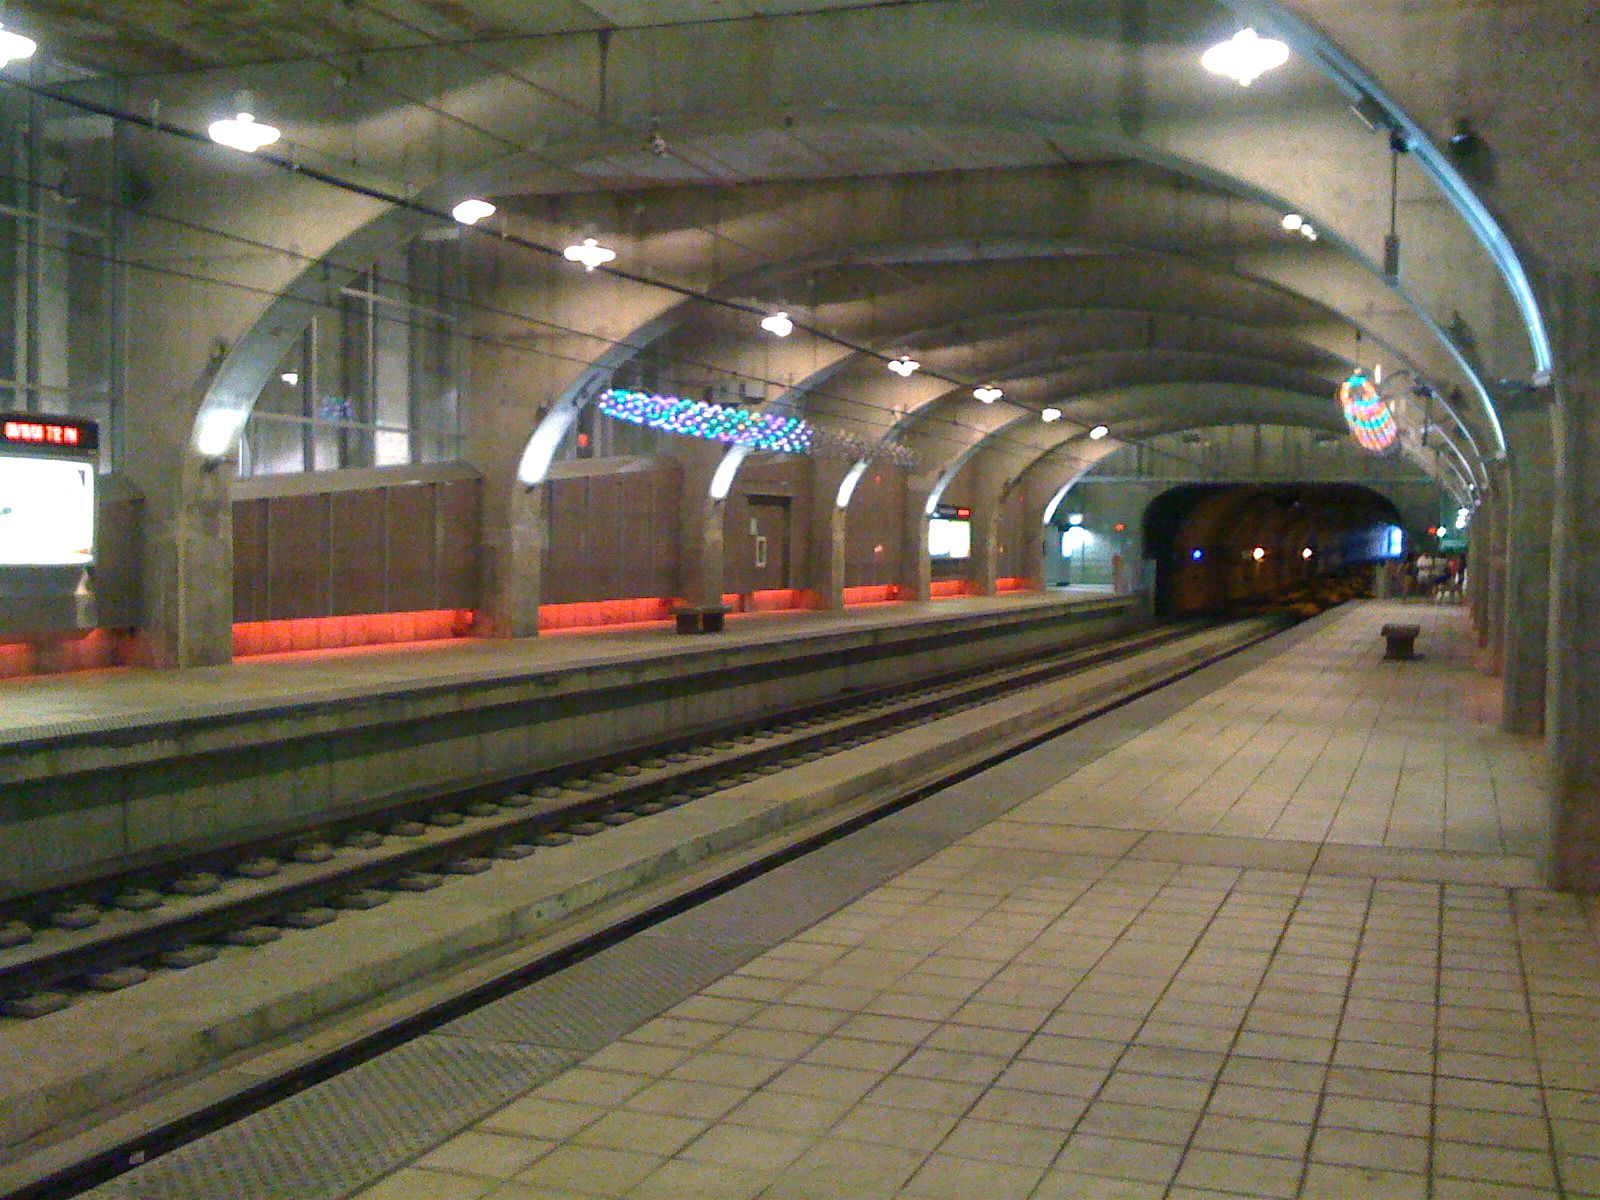 University_City-Big_Bend_MetroLink_station.jpg (1600×1200)